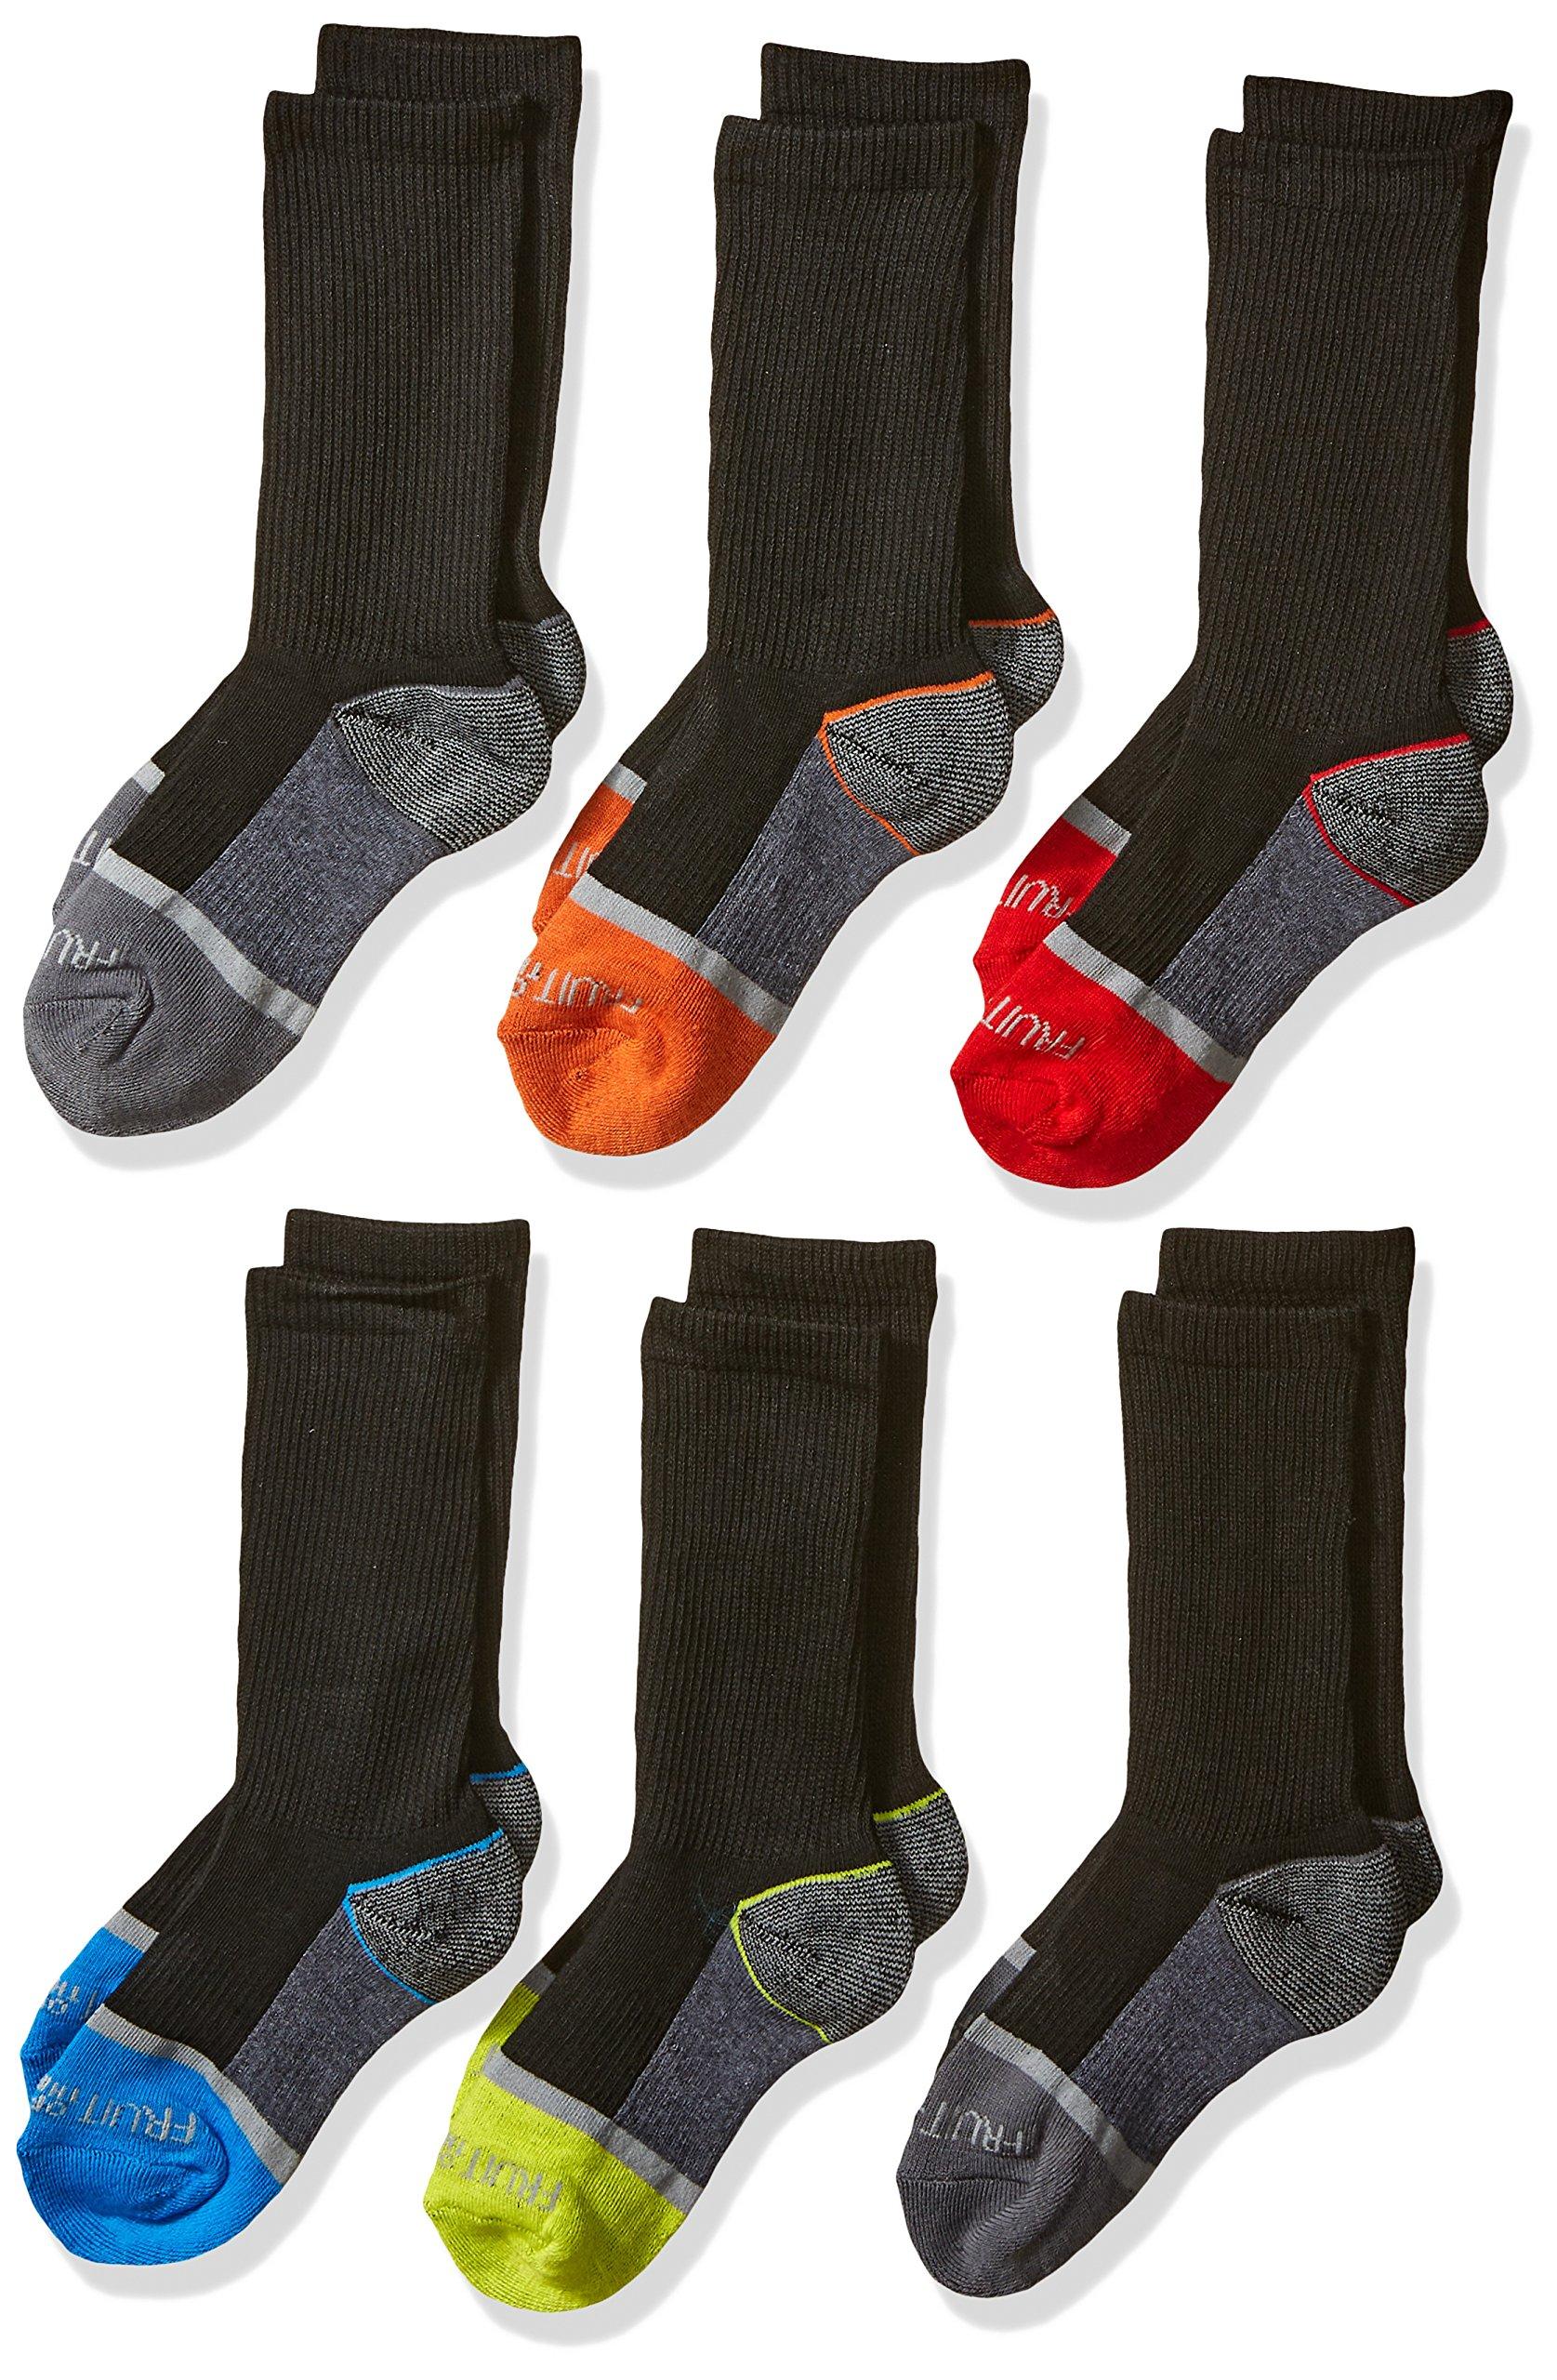 Fruit of the Loom boys 6-pair Half Cushion Crew Socks product image